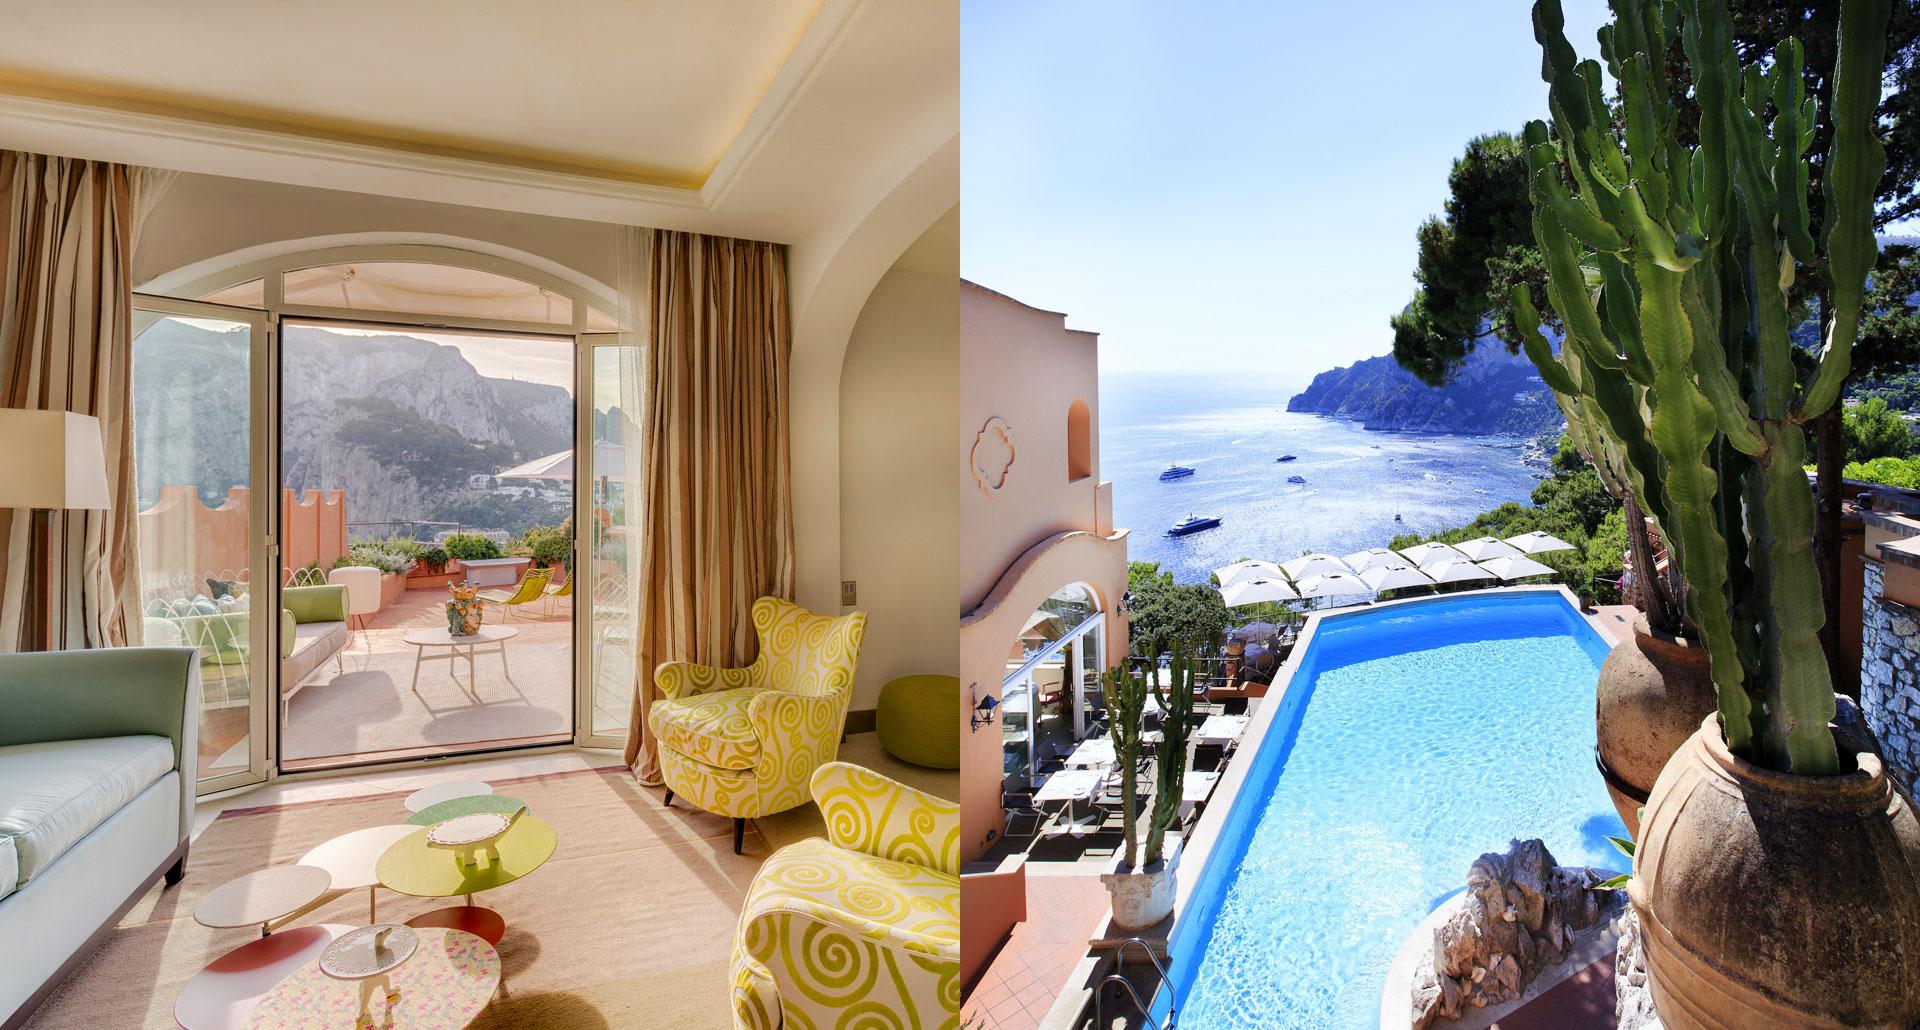 Hotel Punta Tragara - boutique hotel in Capri, Italy